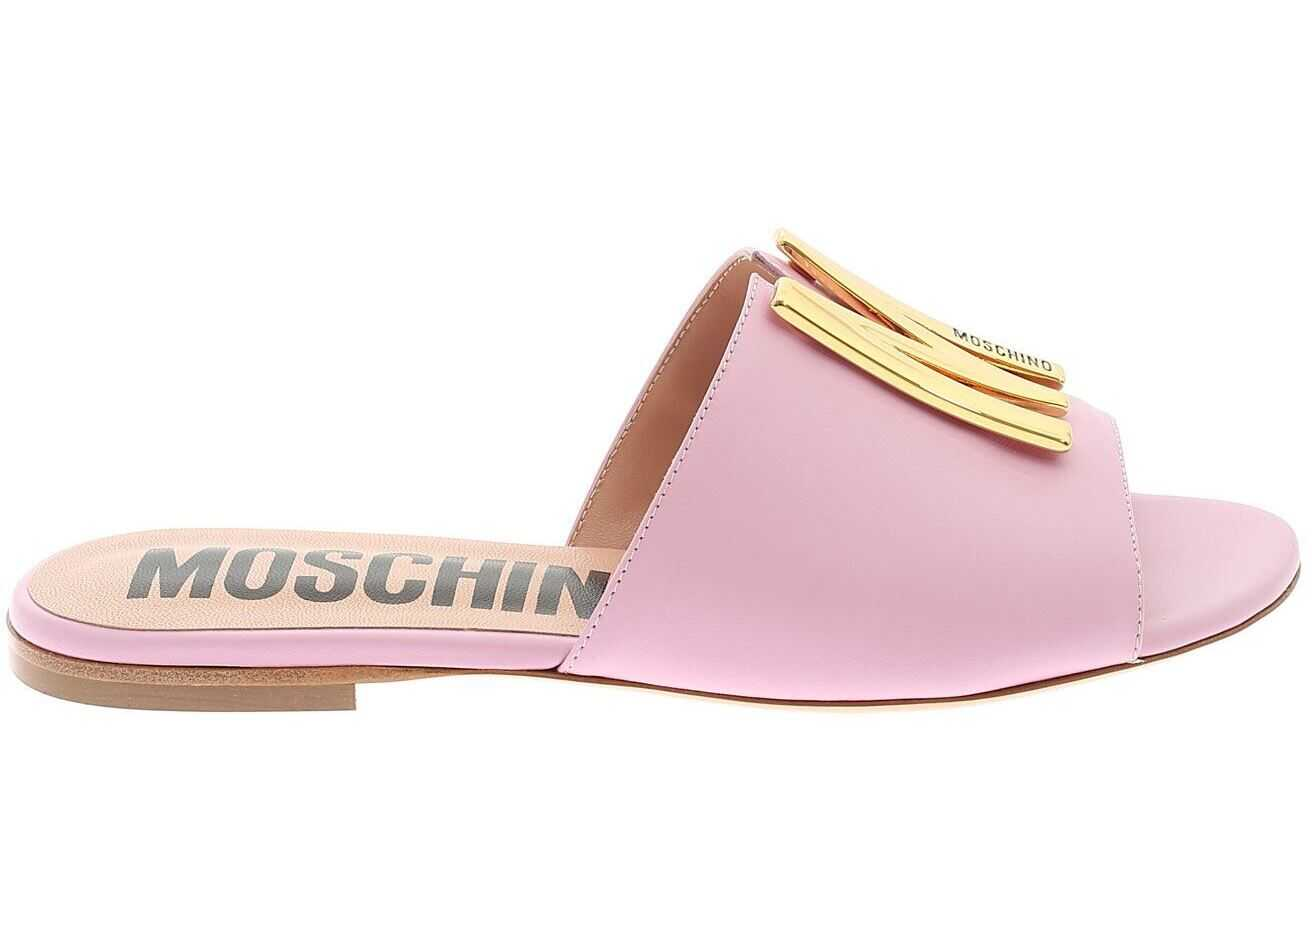 Moschino Metal Logo Mules In Pink MA28101C0CMF0600 Pink imagine b-mall.ro